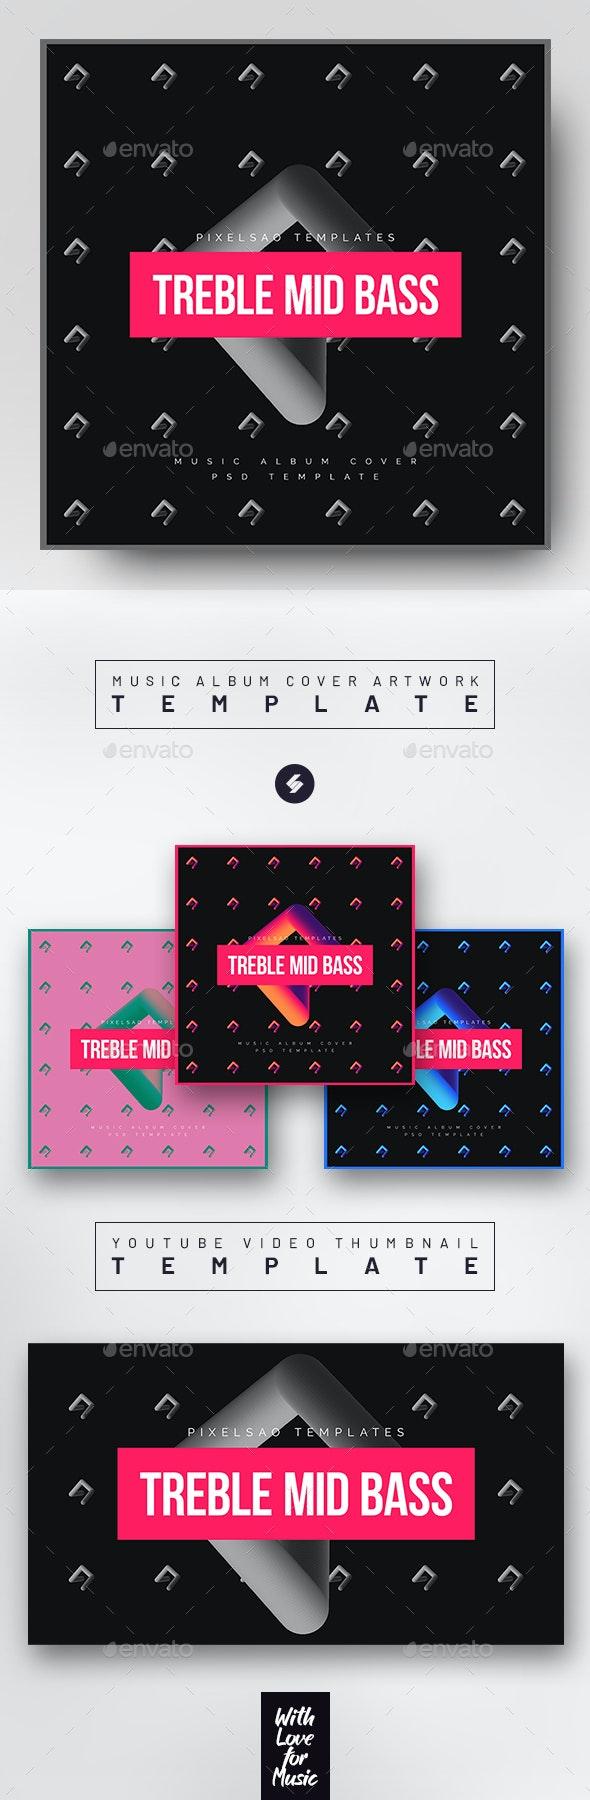 Electronic Music 2 – Album Cover Artwork Template - Miscellaneous Social Media